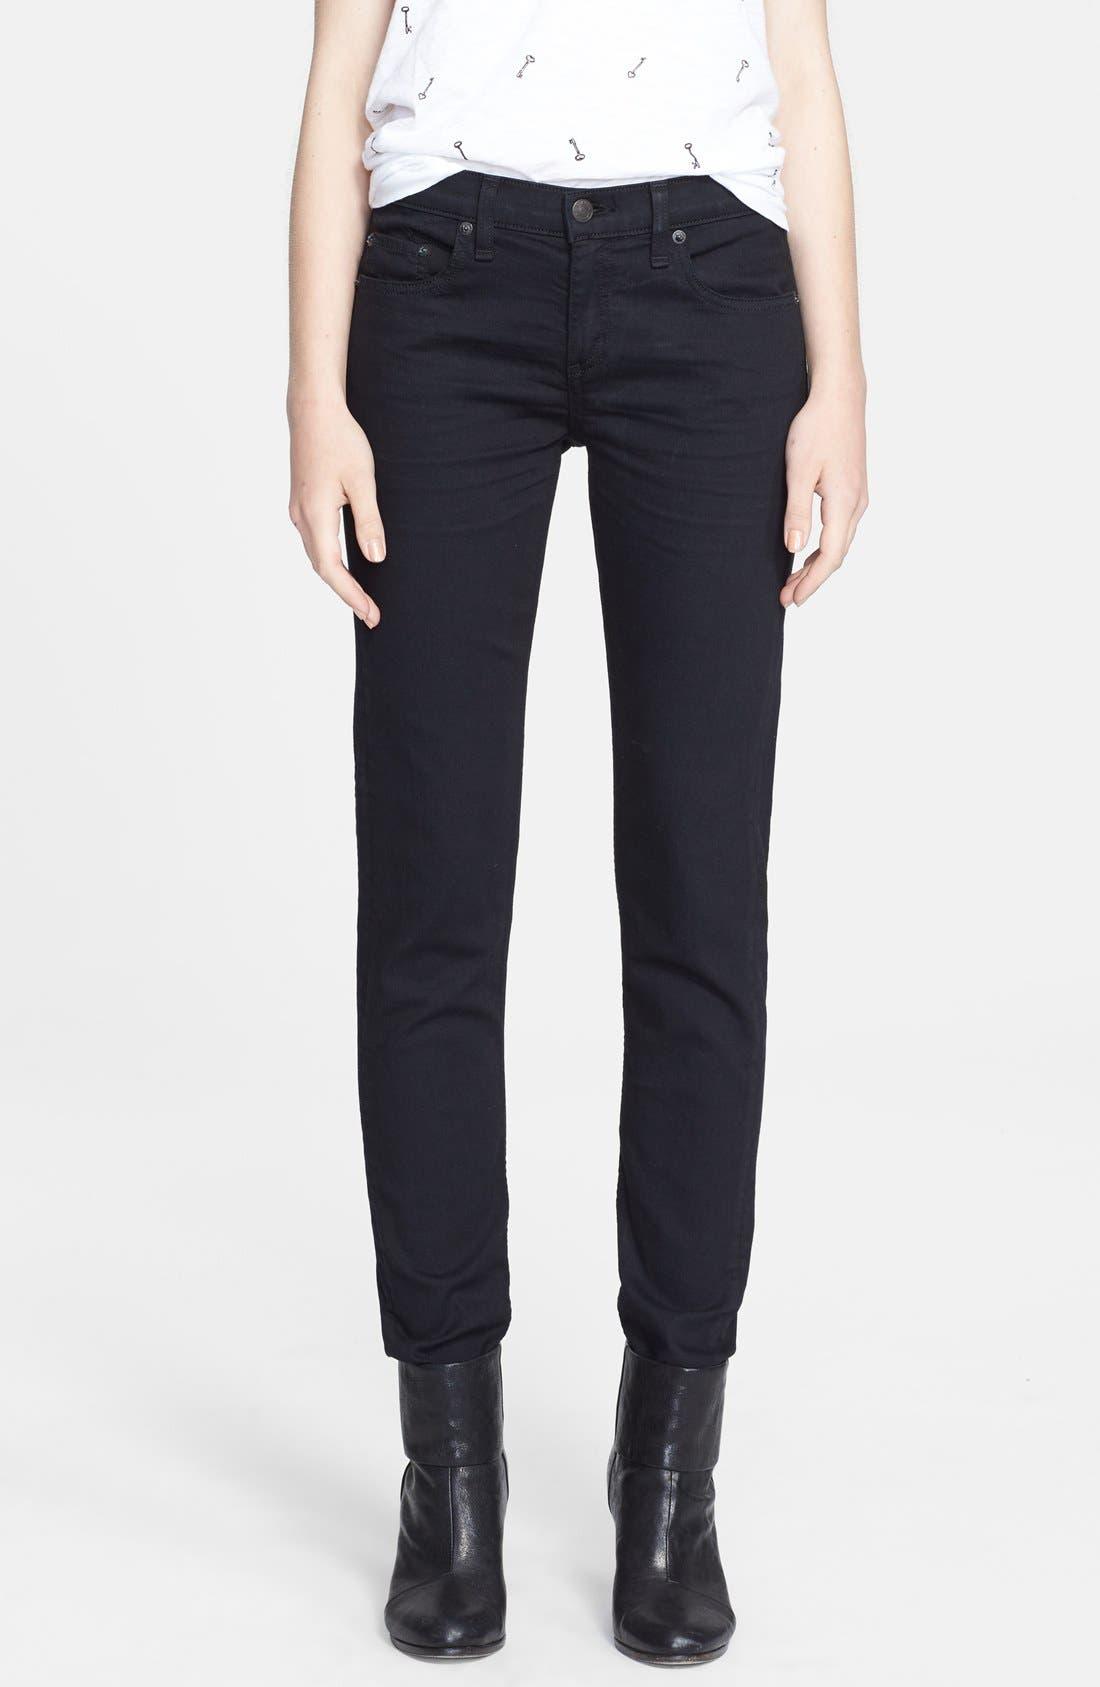 Alternate Image 1 Selected - rag & bone/JEAN 'The Dre' Skinny Jeans (Aged Black)